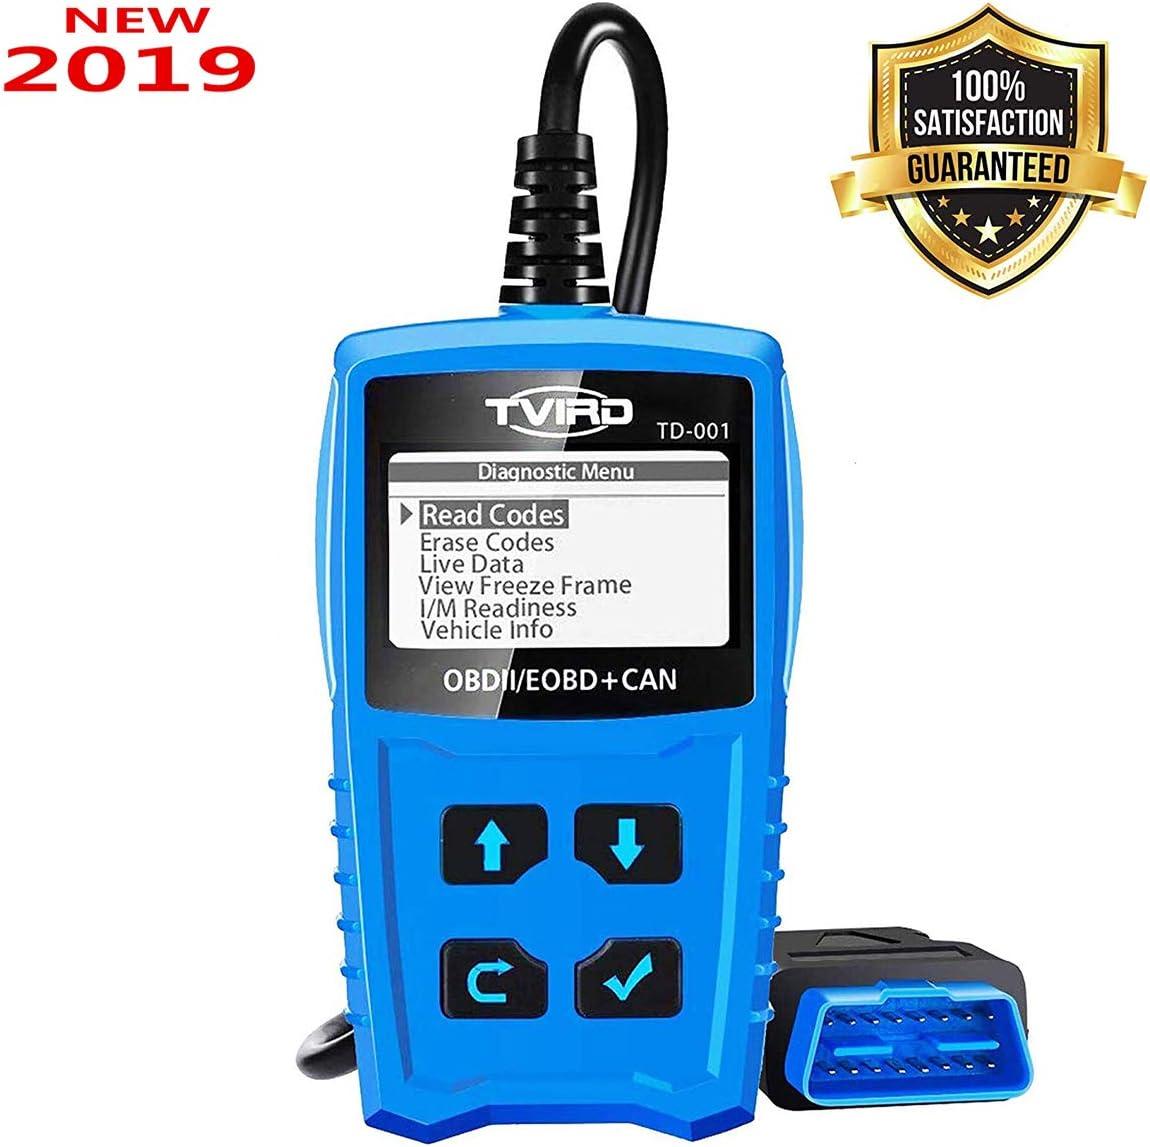 Tvird OBD2 Auto Diagnóstico,OBD II Escáner Motor Detector de Fallas Eliminar Códigos Error,Adecuado para Coche con Modo OBD2 / EOBD/Can e Interfaz OBDII de 16 Pin, Detección de Estado de Batería